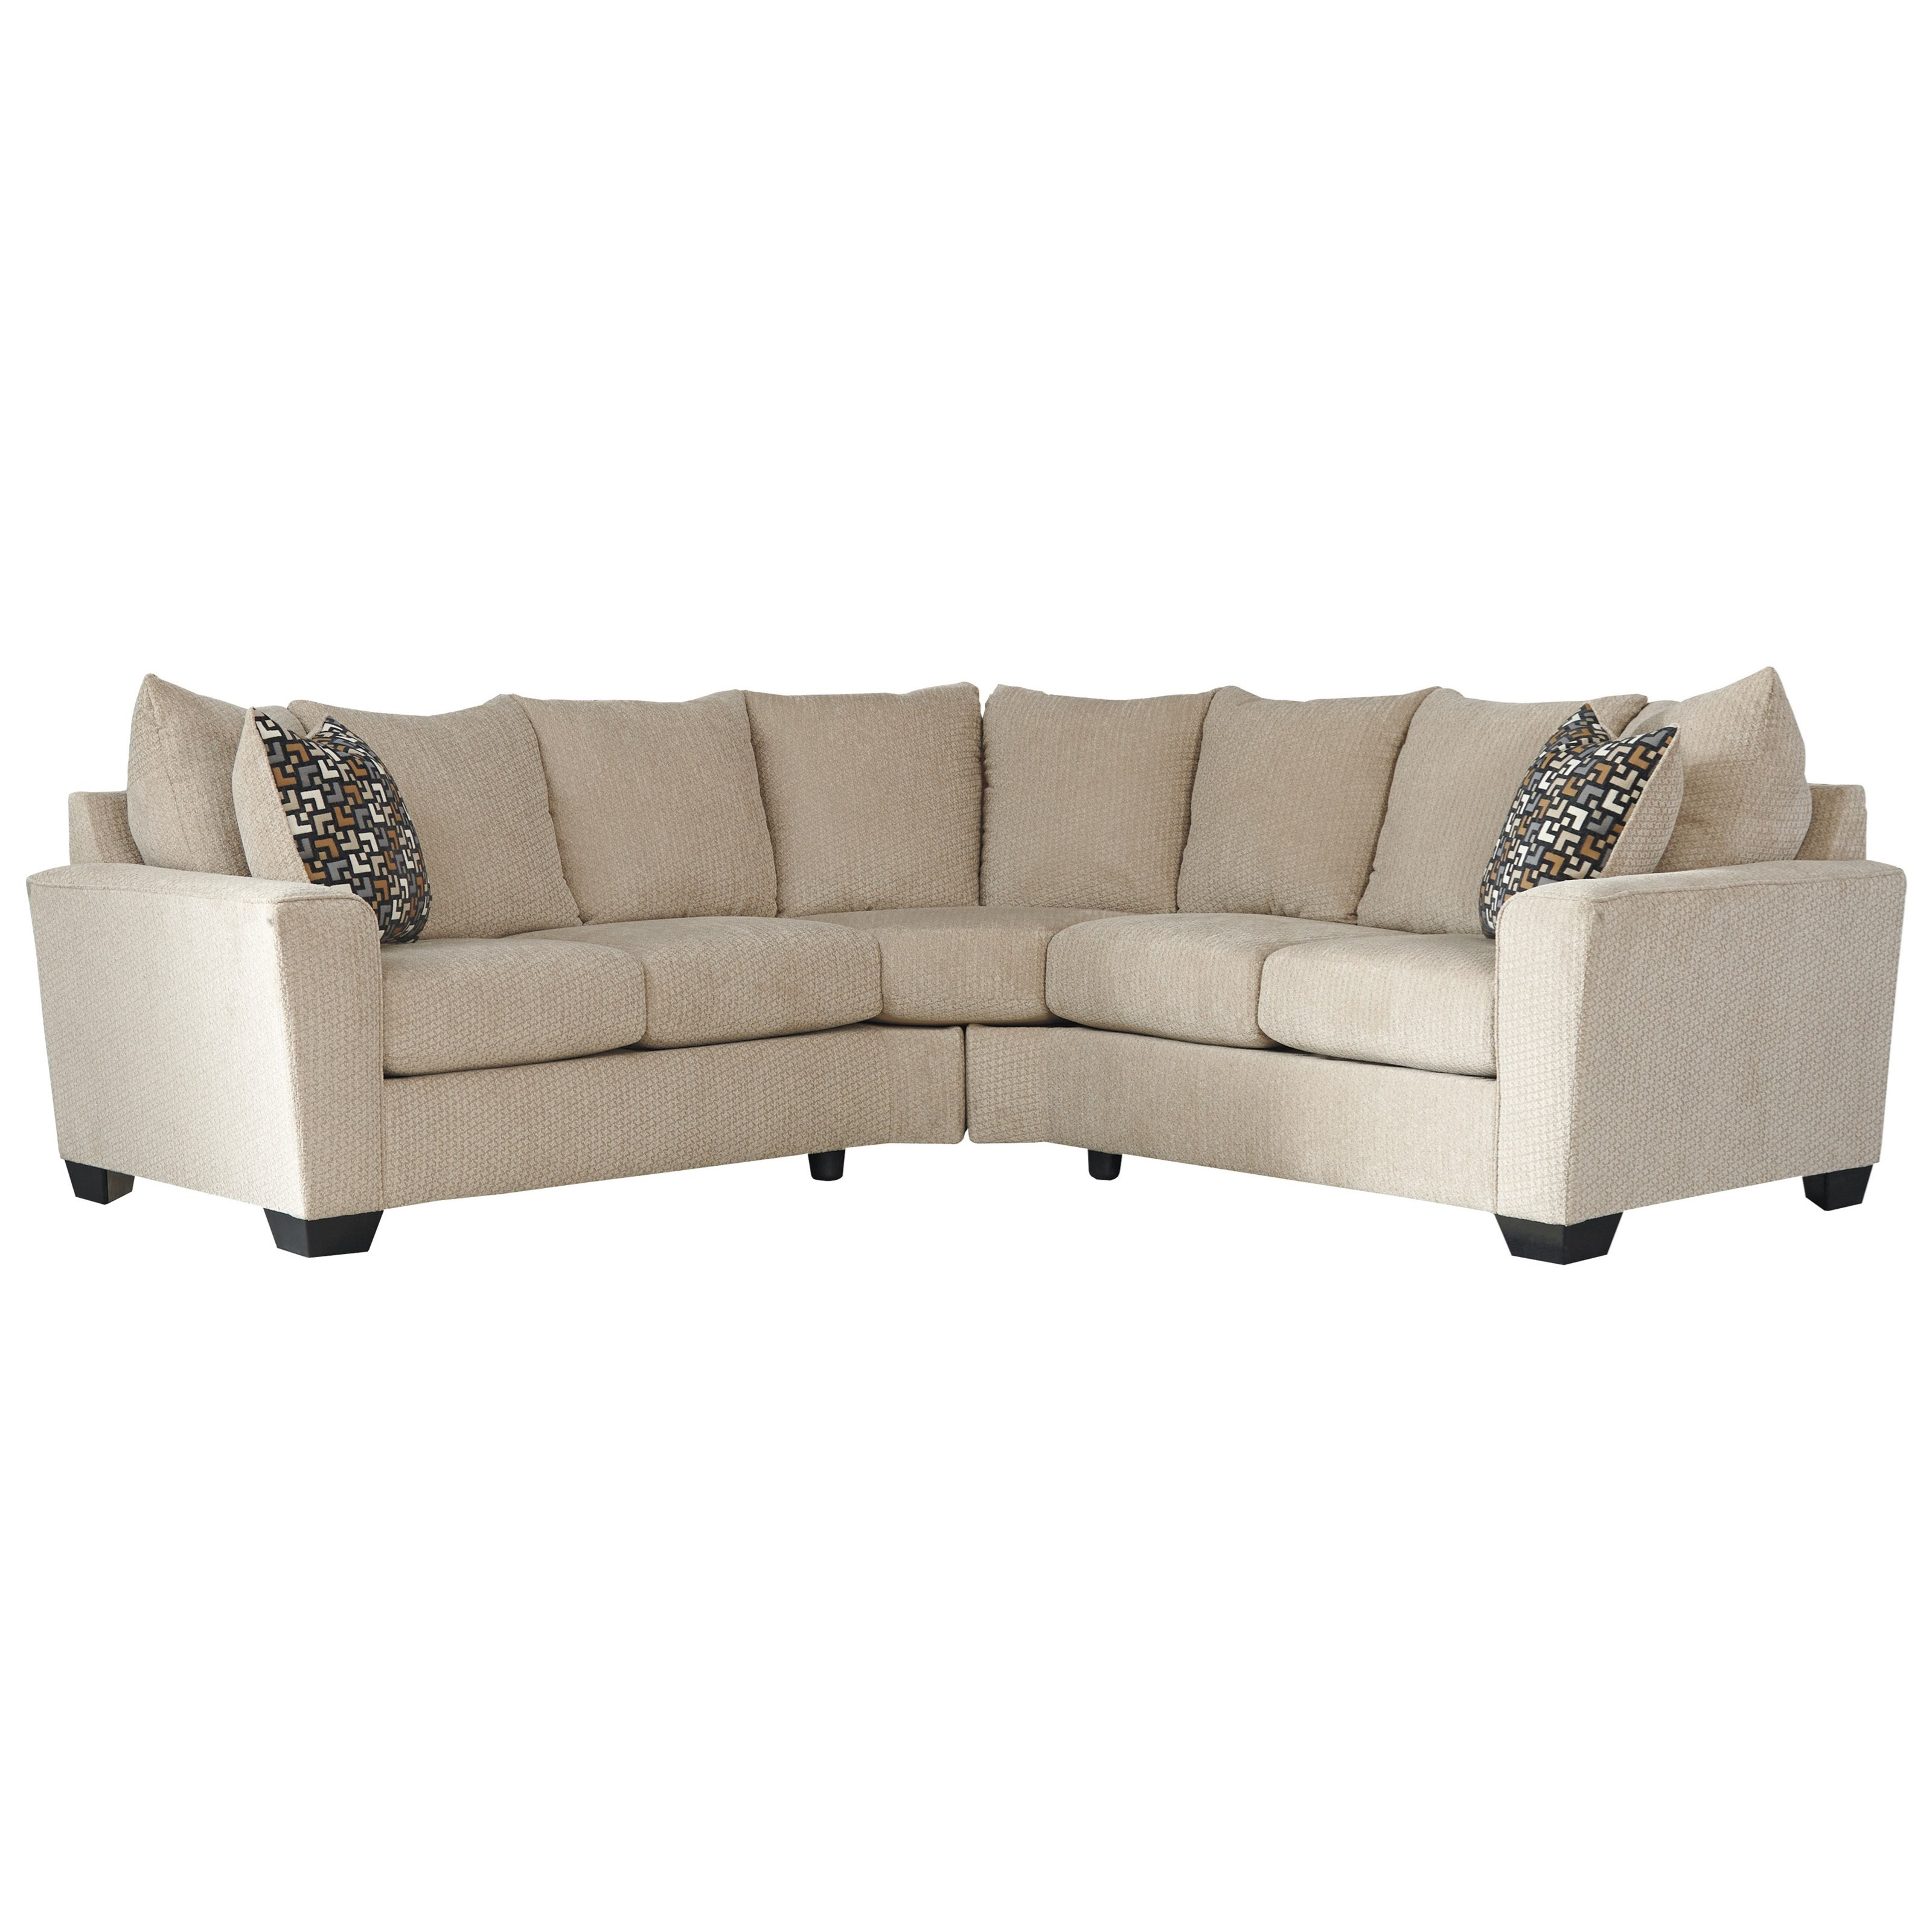 sectional sofa corner wedge kursi klasik modern unique sofas